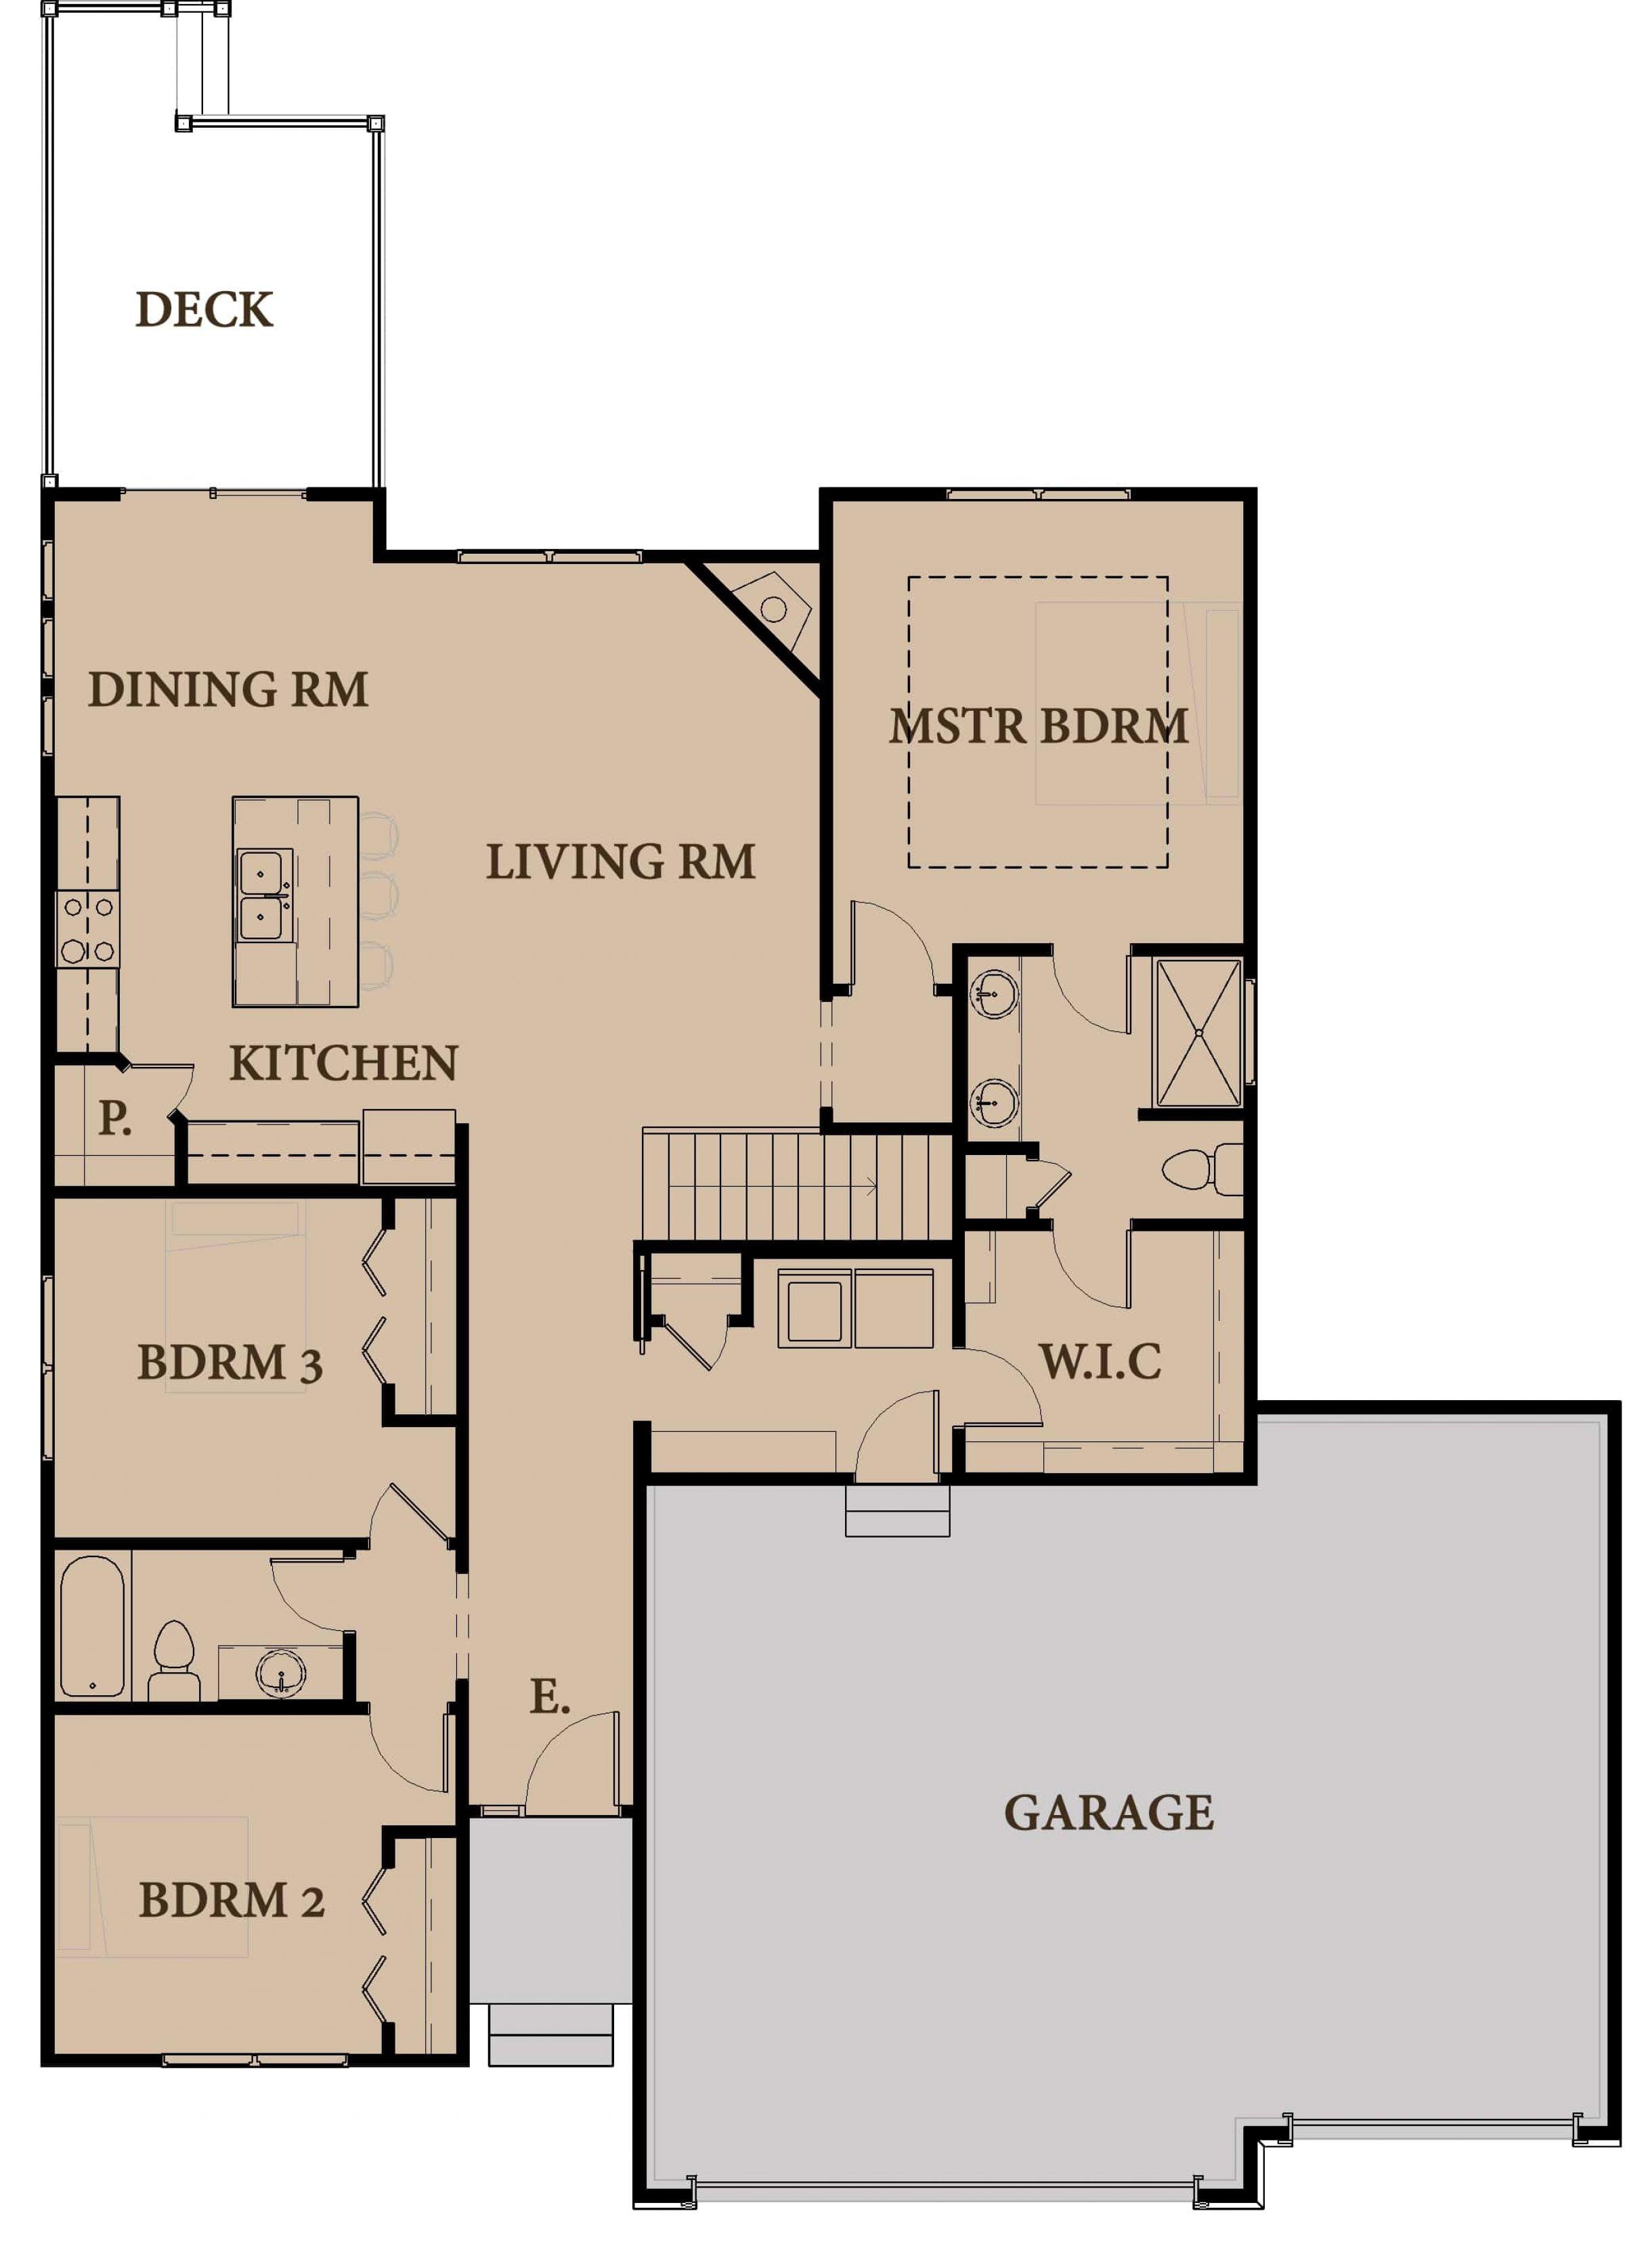 residential-polk-county-iowa-0-acres-listing-number-14997-1-2020-05-15-141521.jpg